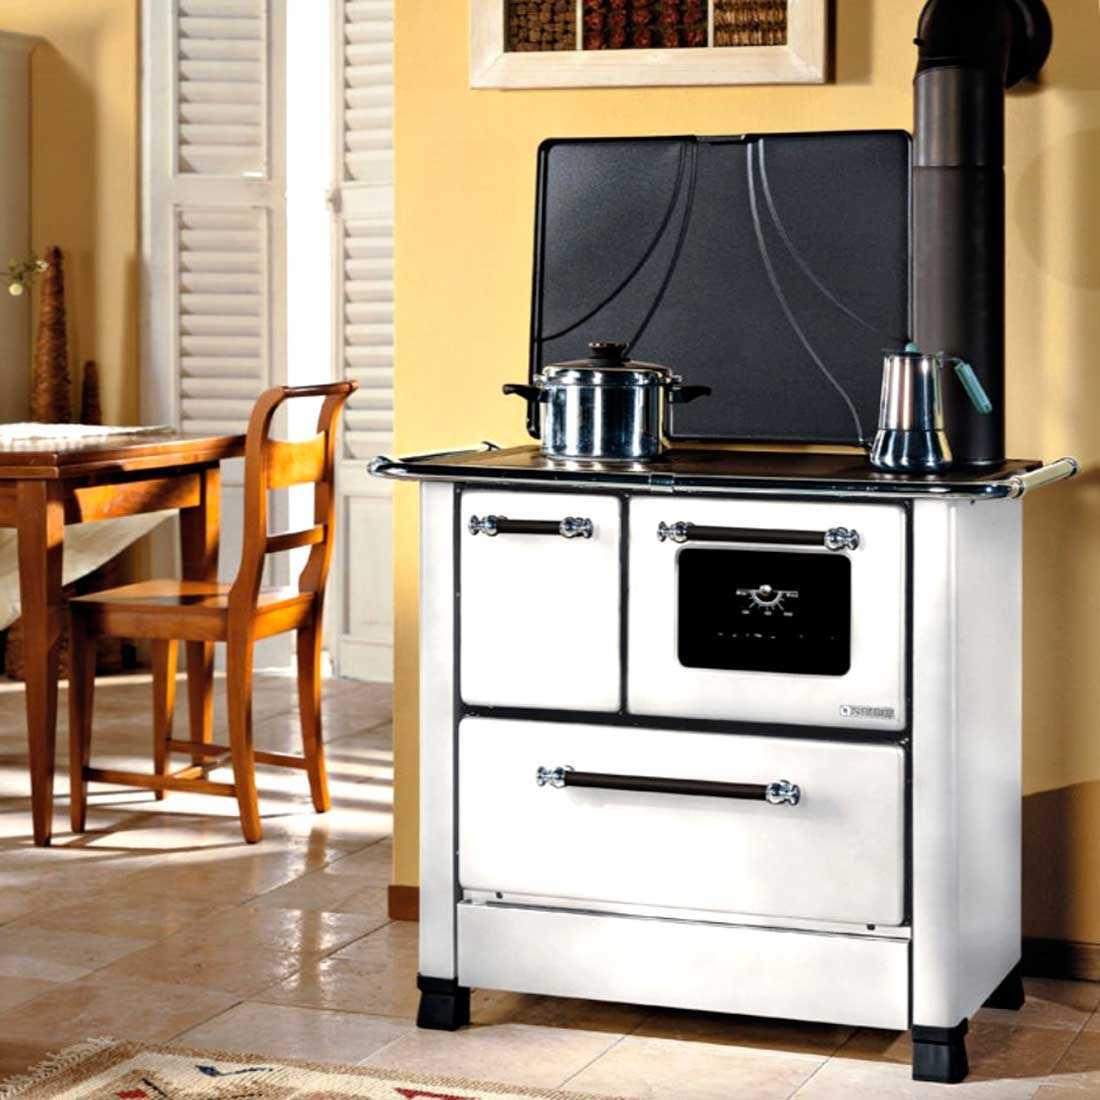 Cucina a legna bianca Nordica Romantica 3,5 potenza termica 5,0 Kw